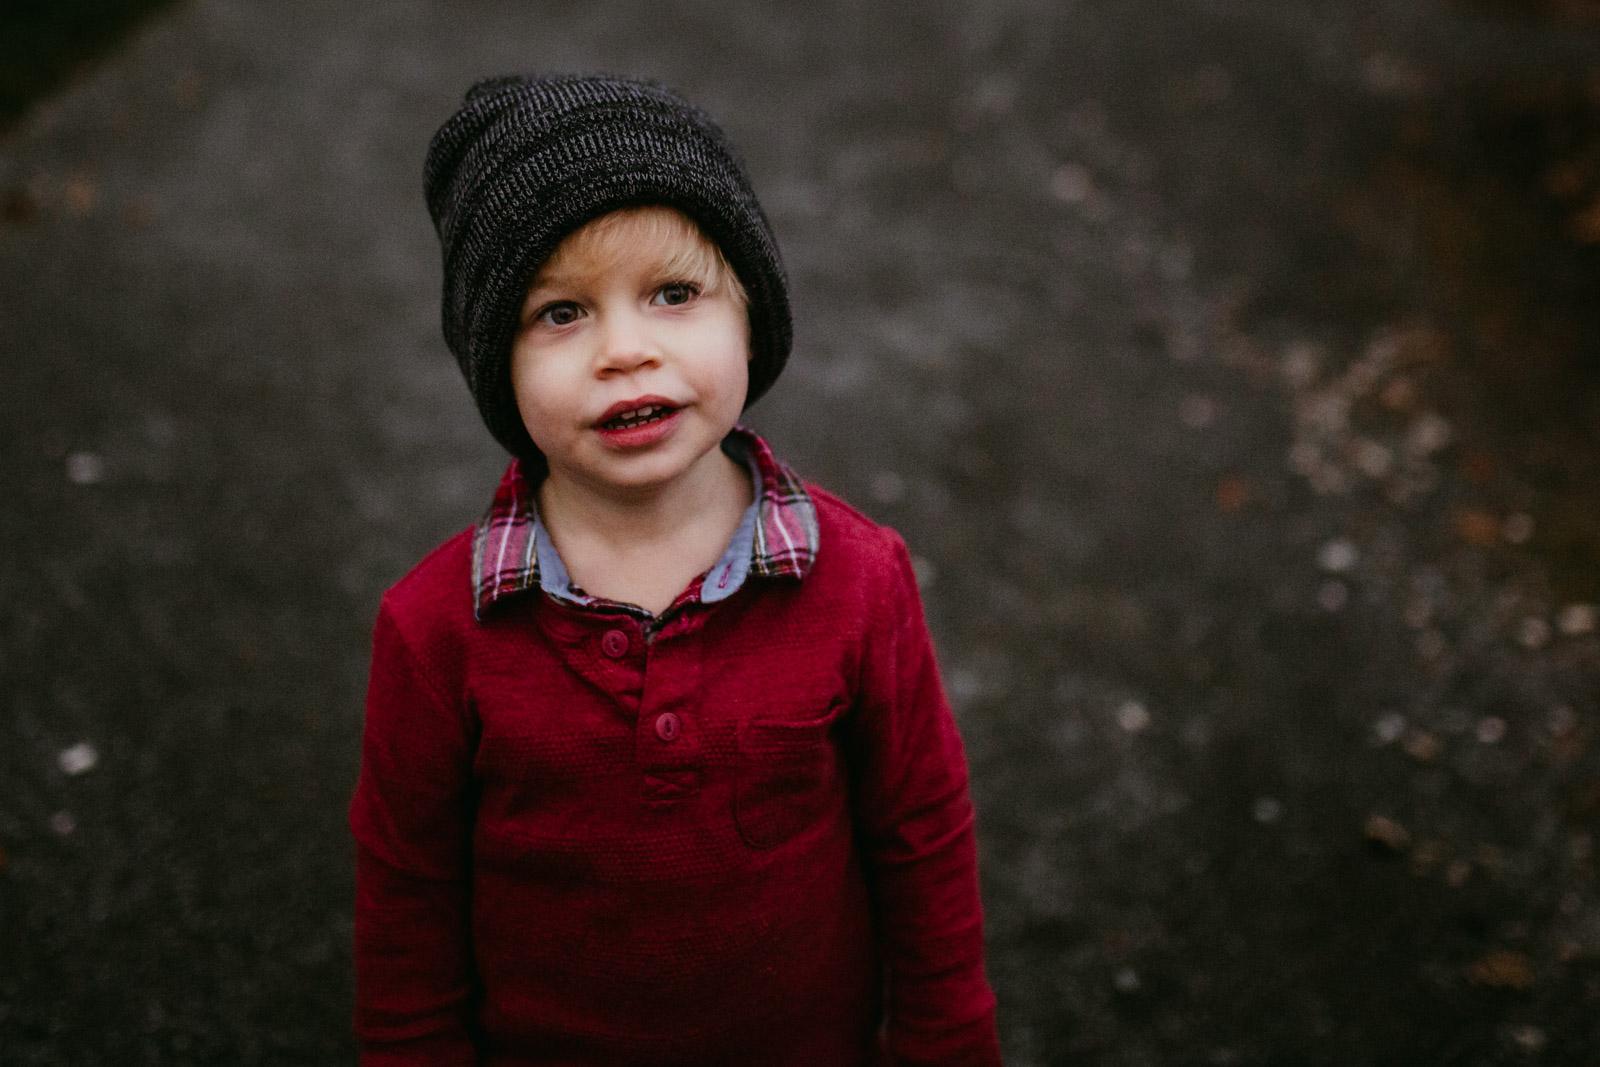 Portrait of toddler boy at The Barn at One Loudoun, Ashburn, Virginia